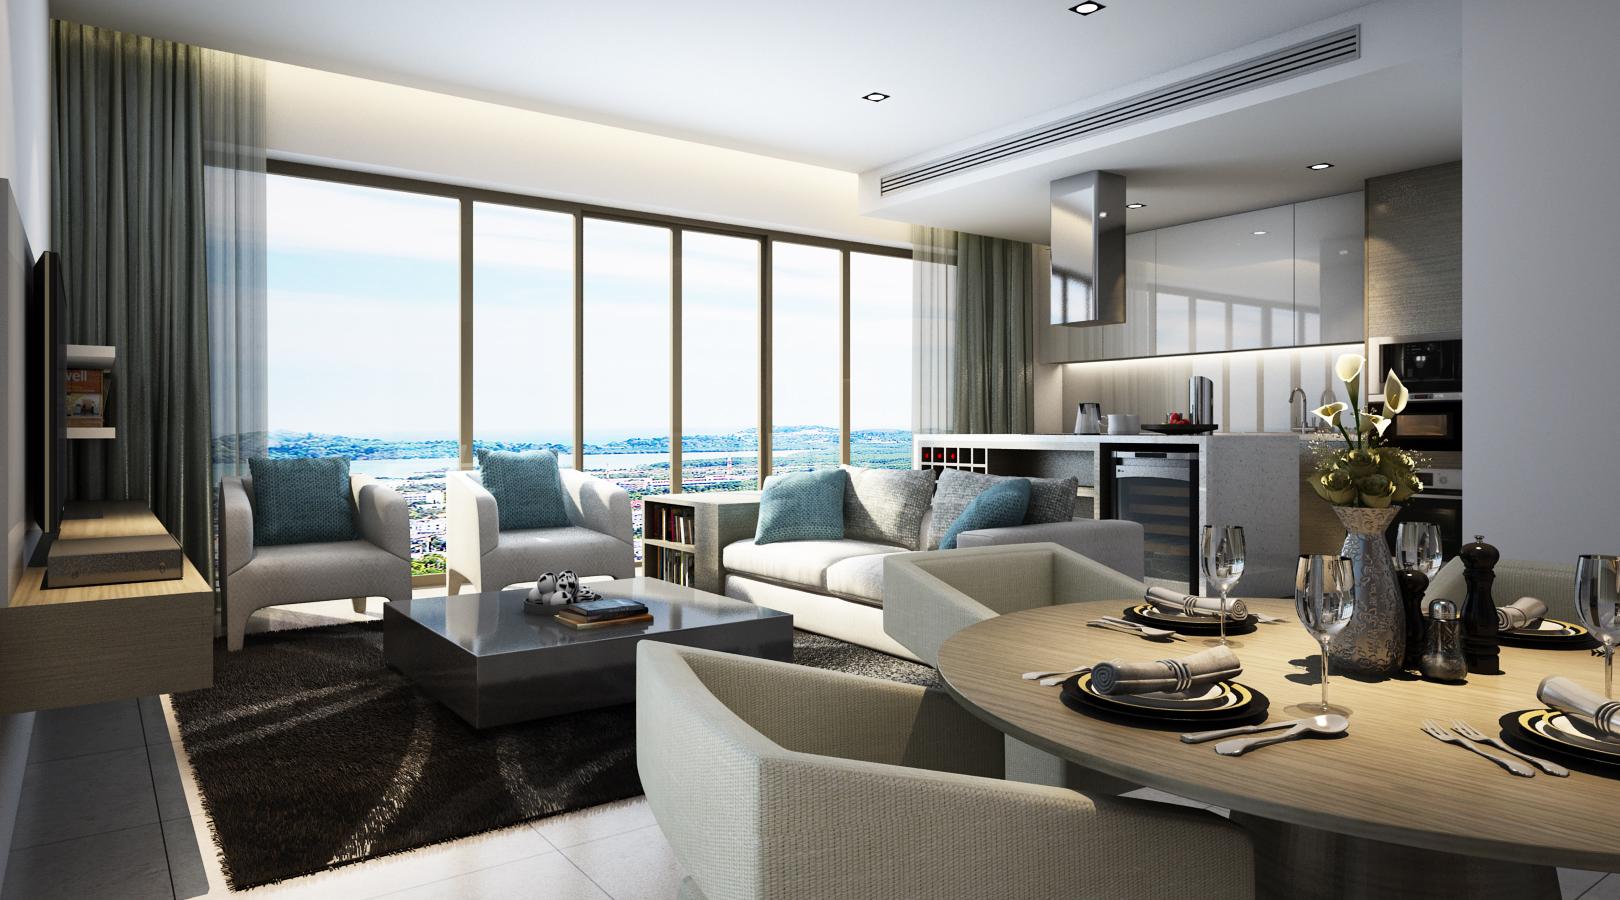 PENT 1 livingroom.jpg